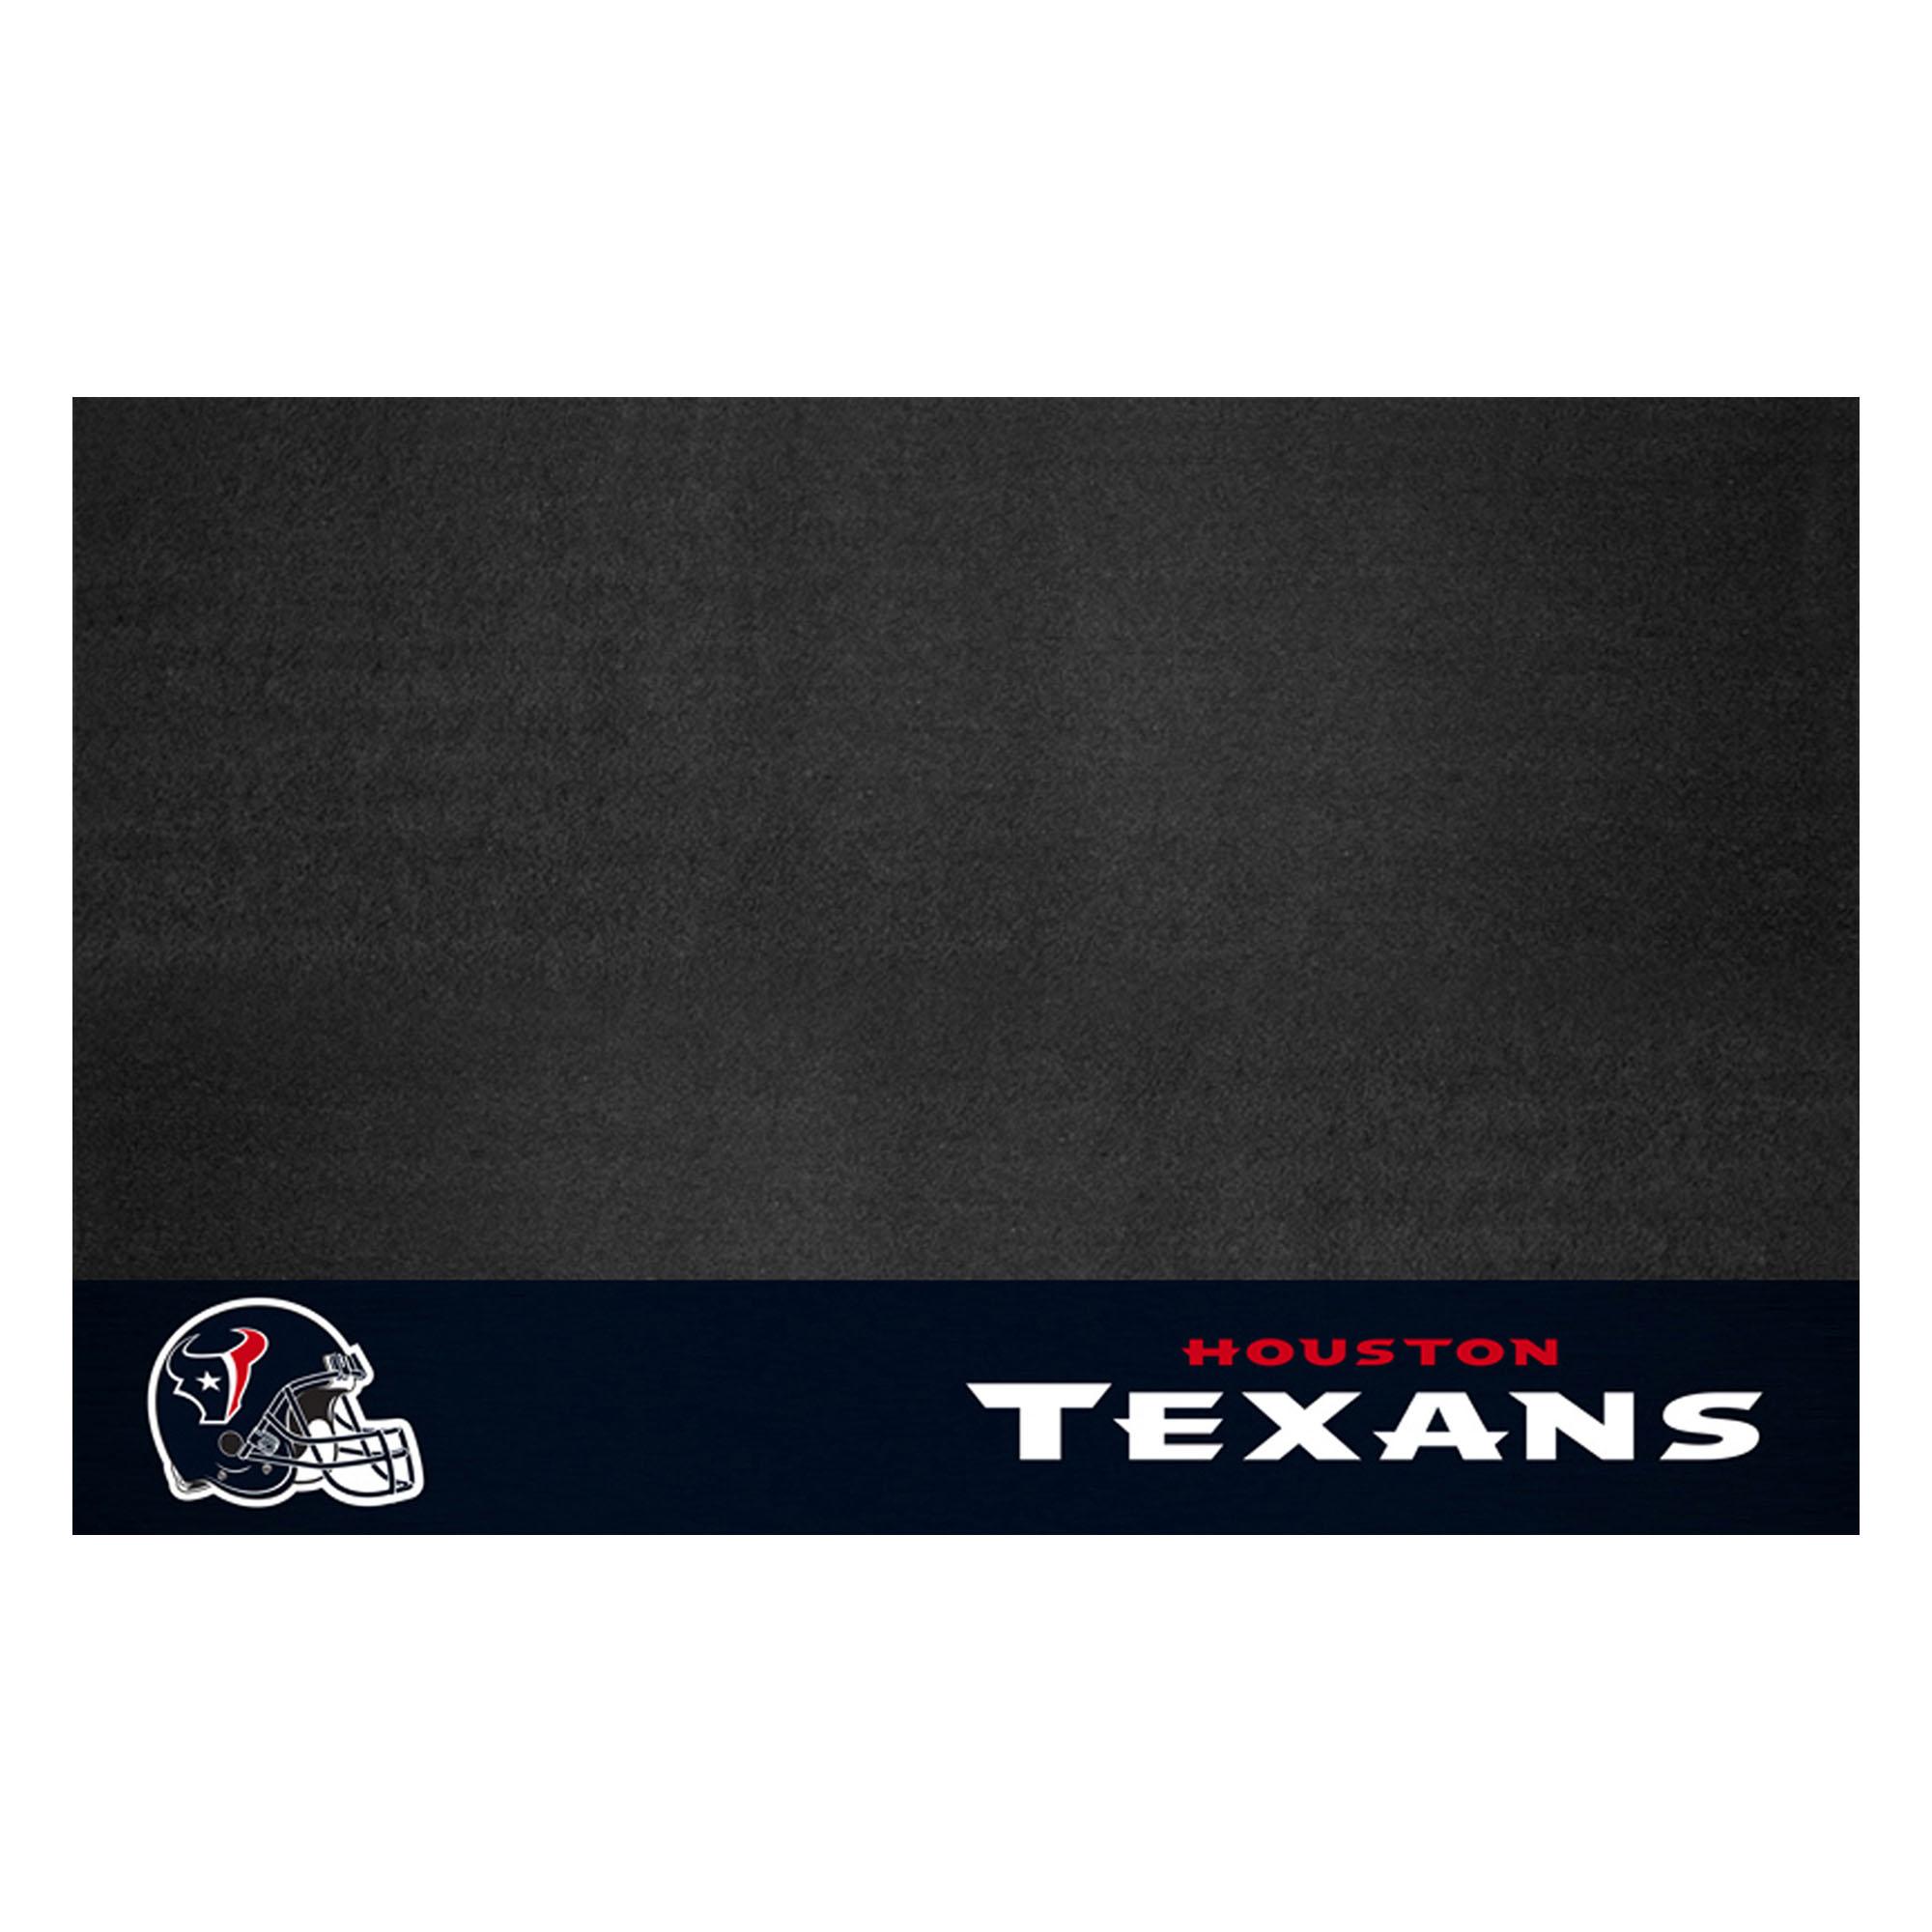 Houston Texans Grill Mat